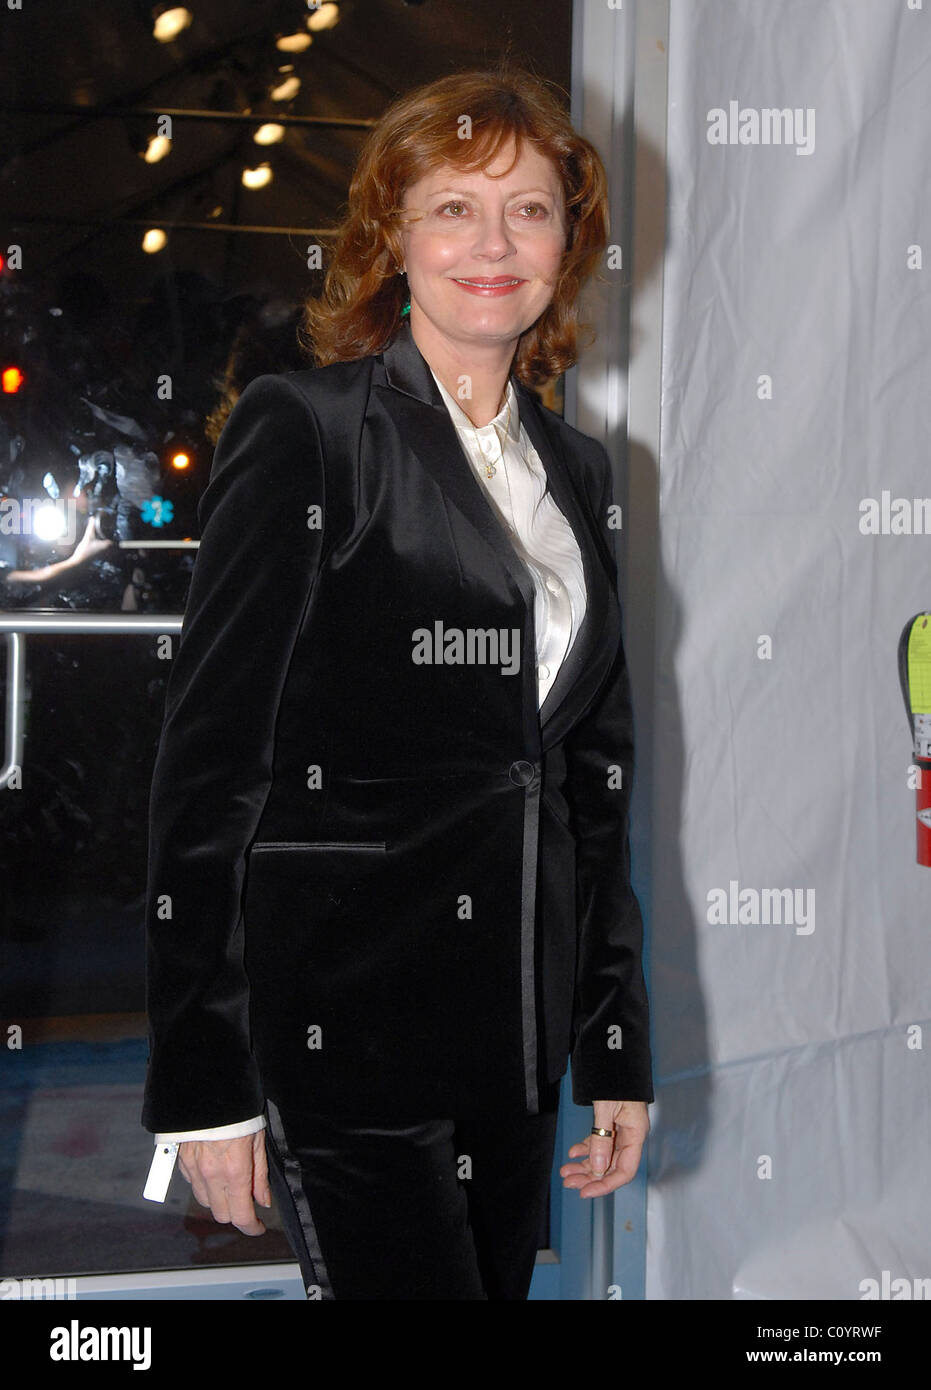 Susan Sarandon The Creative Coalition 2009 Inaugural Ball held at Sidney Harman Hall - Arrivals Washington DC, USA Stock Photo